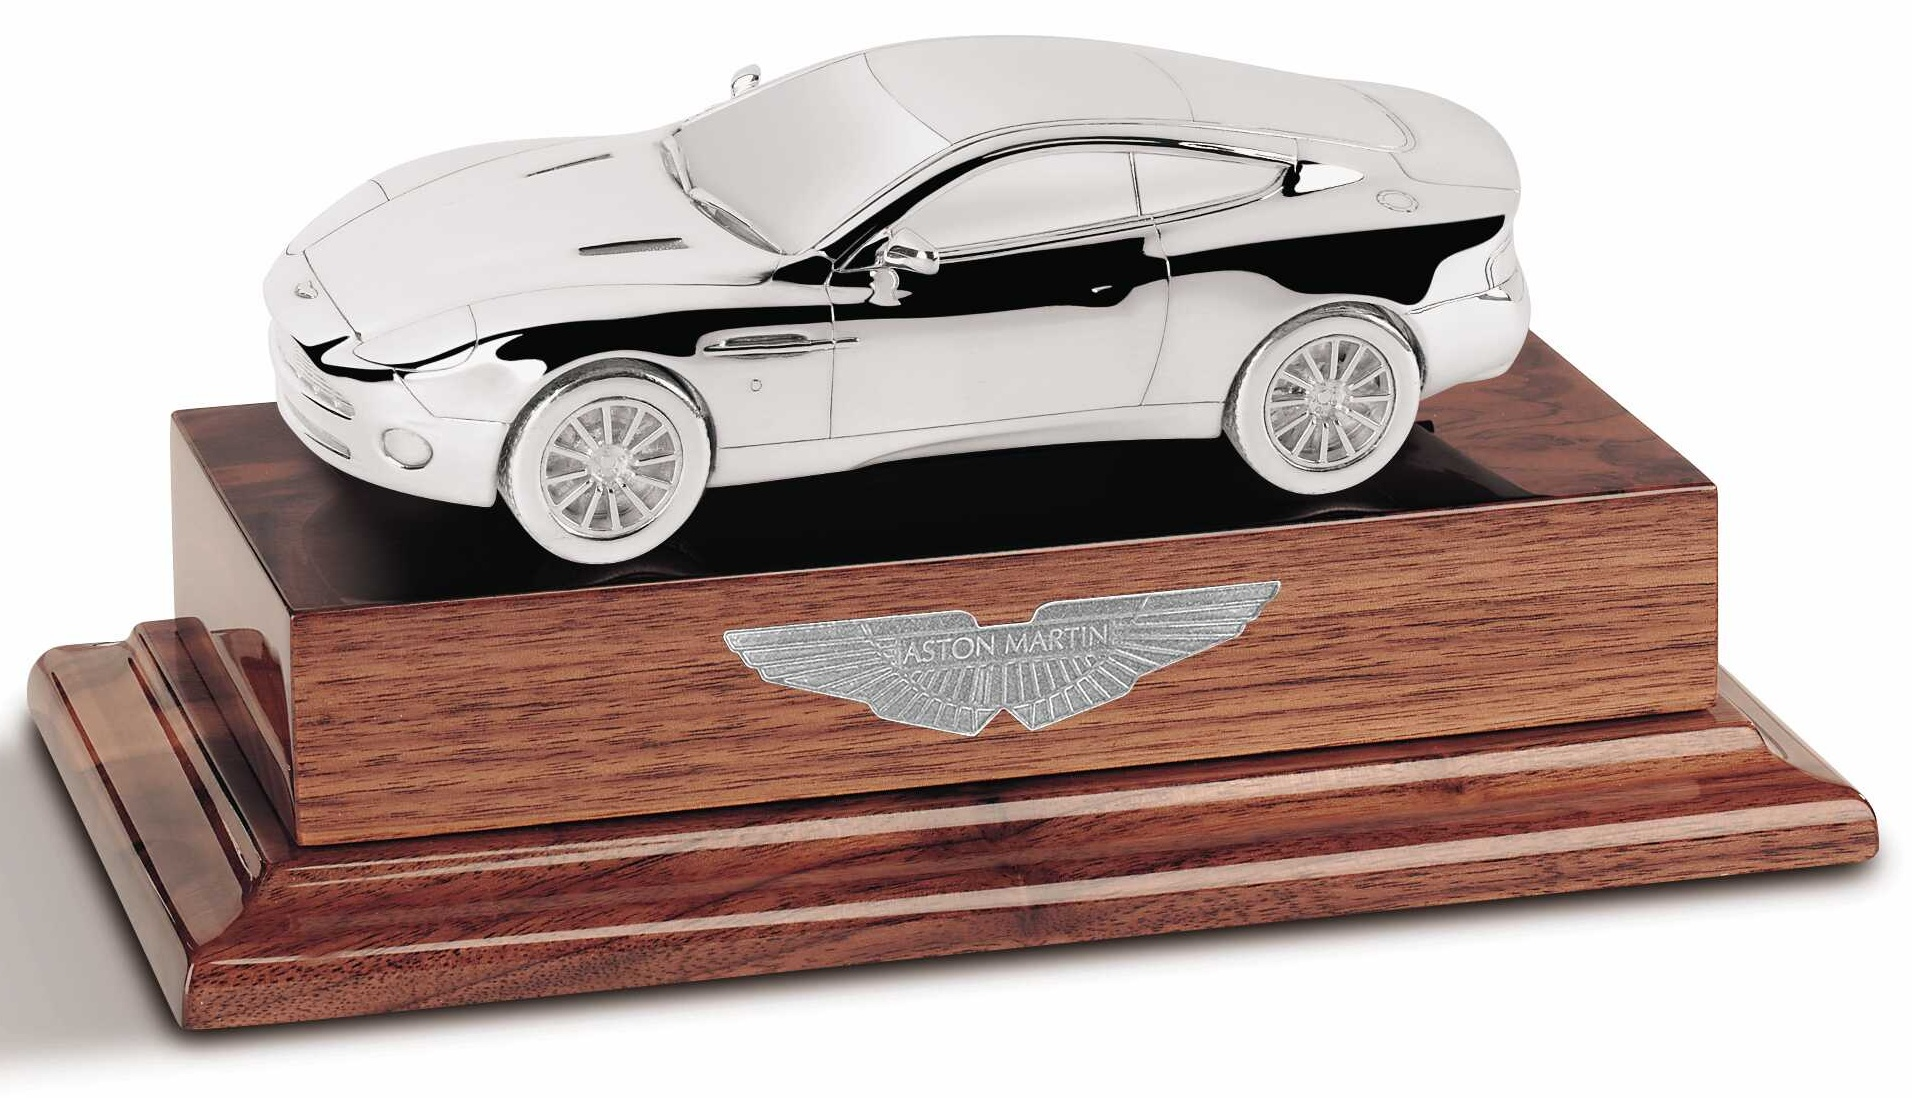 Silver Aston Martin 1:24 scale Vanquish